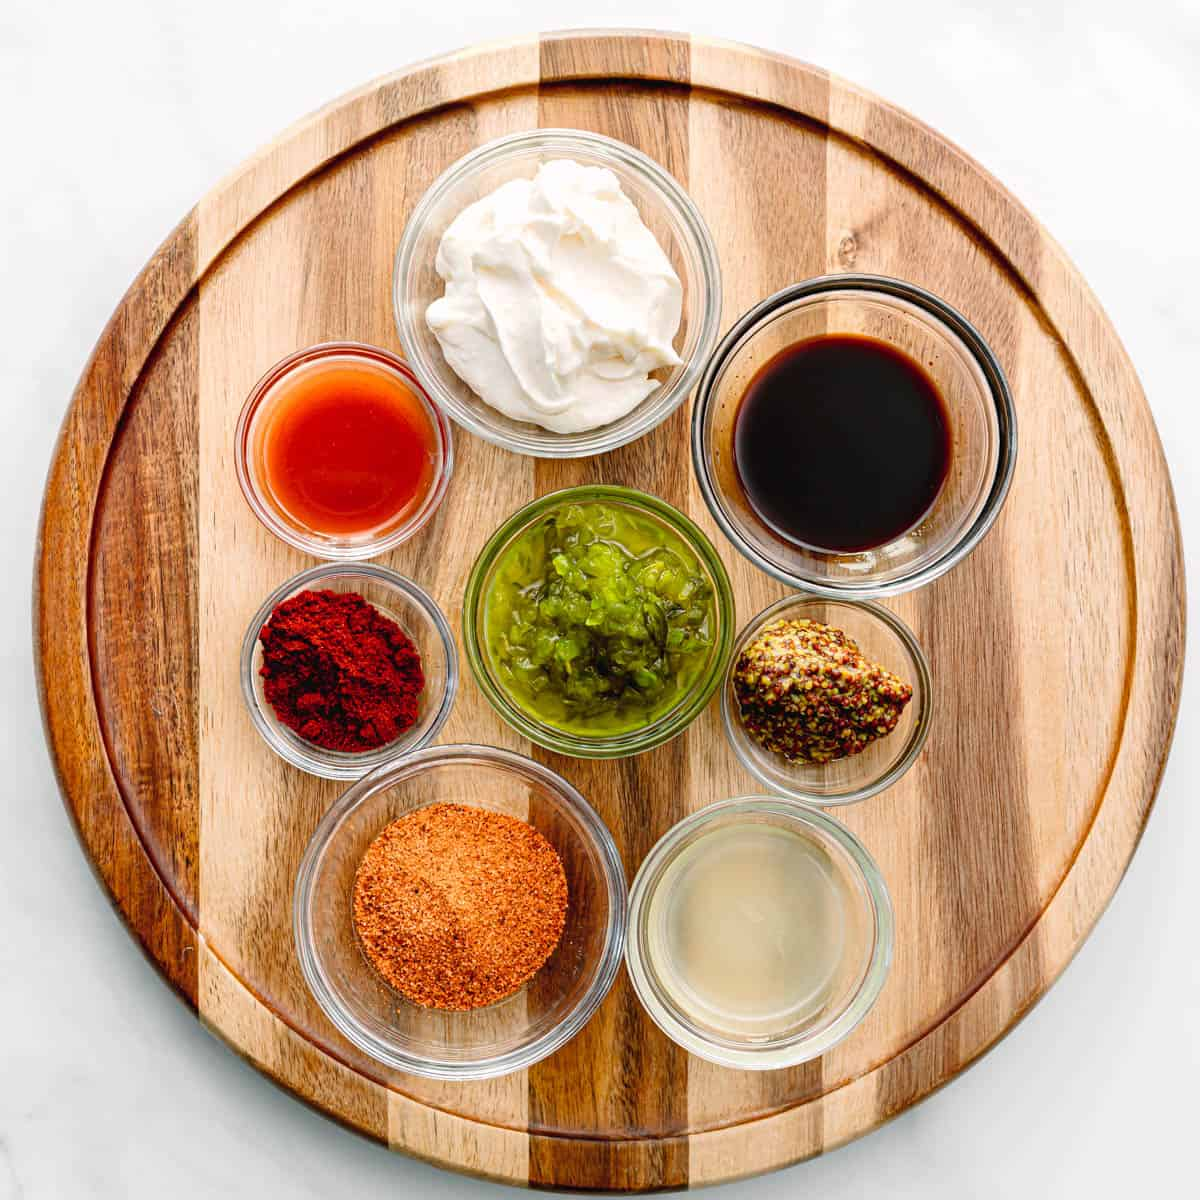 Ingredients for Cajun Remoulade Sauce Recipe